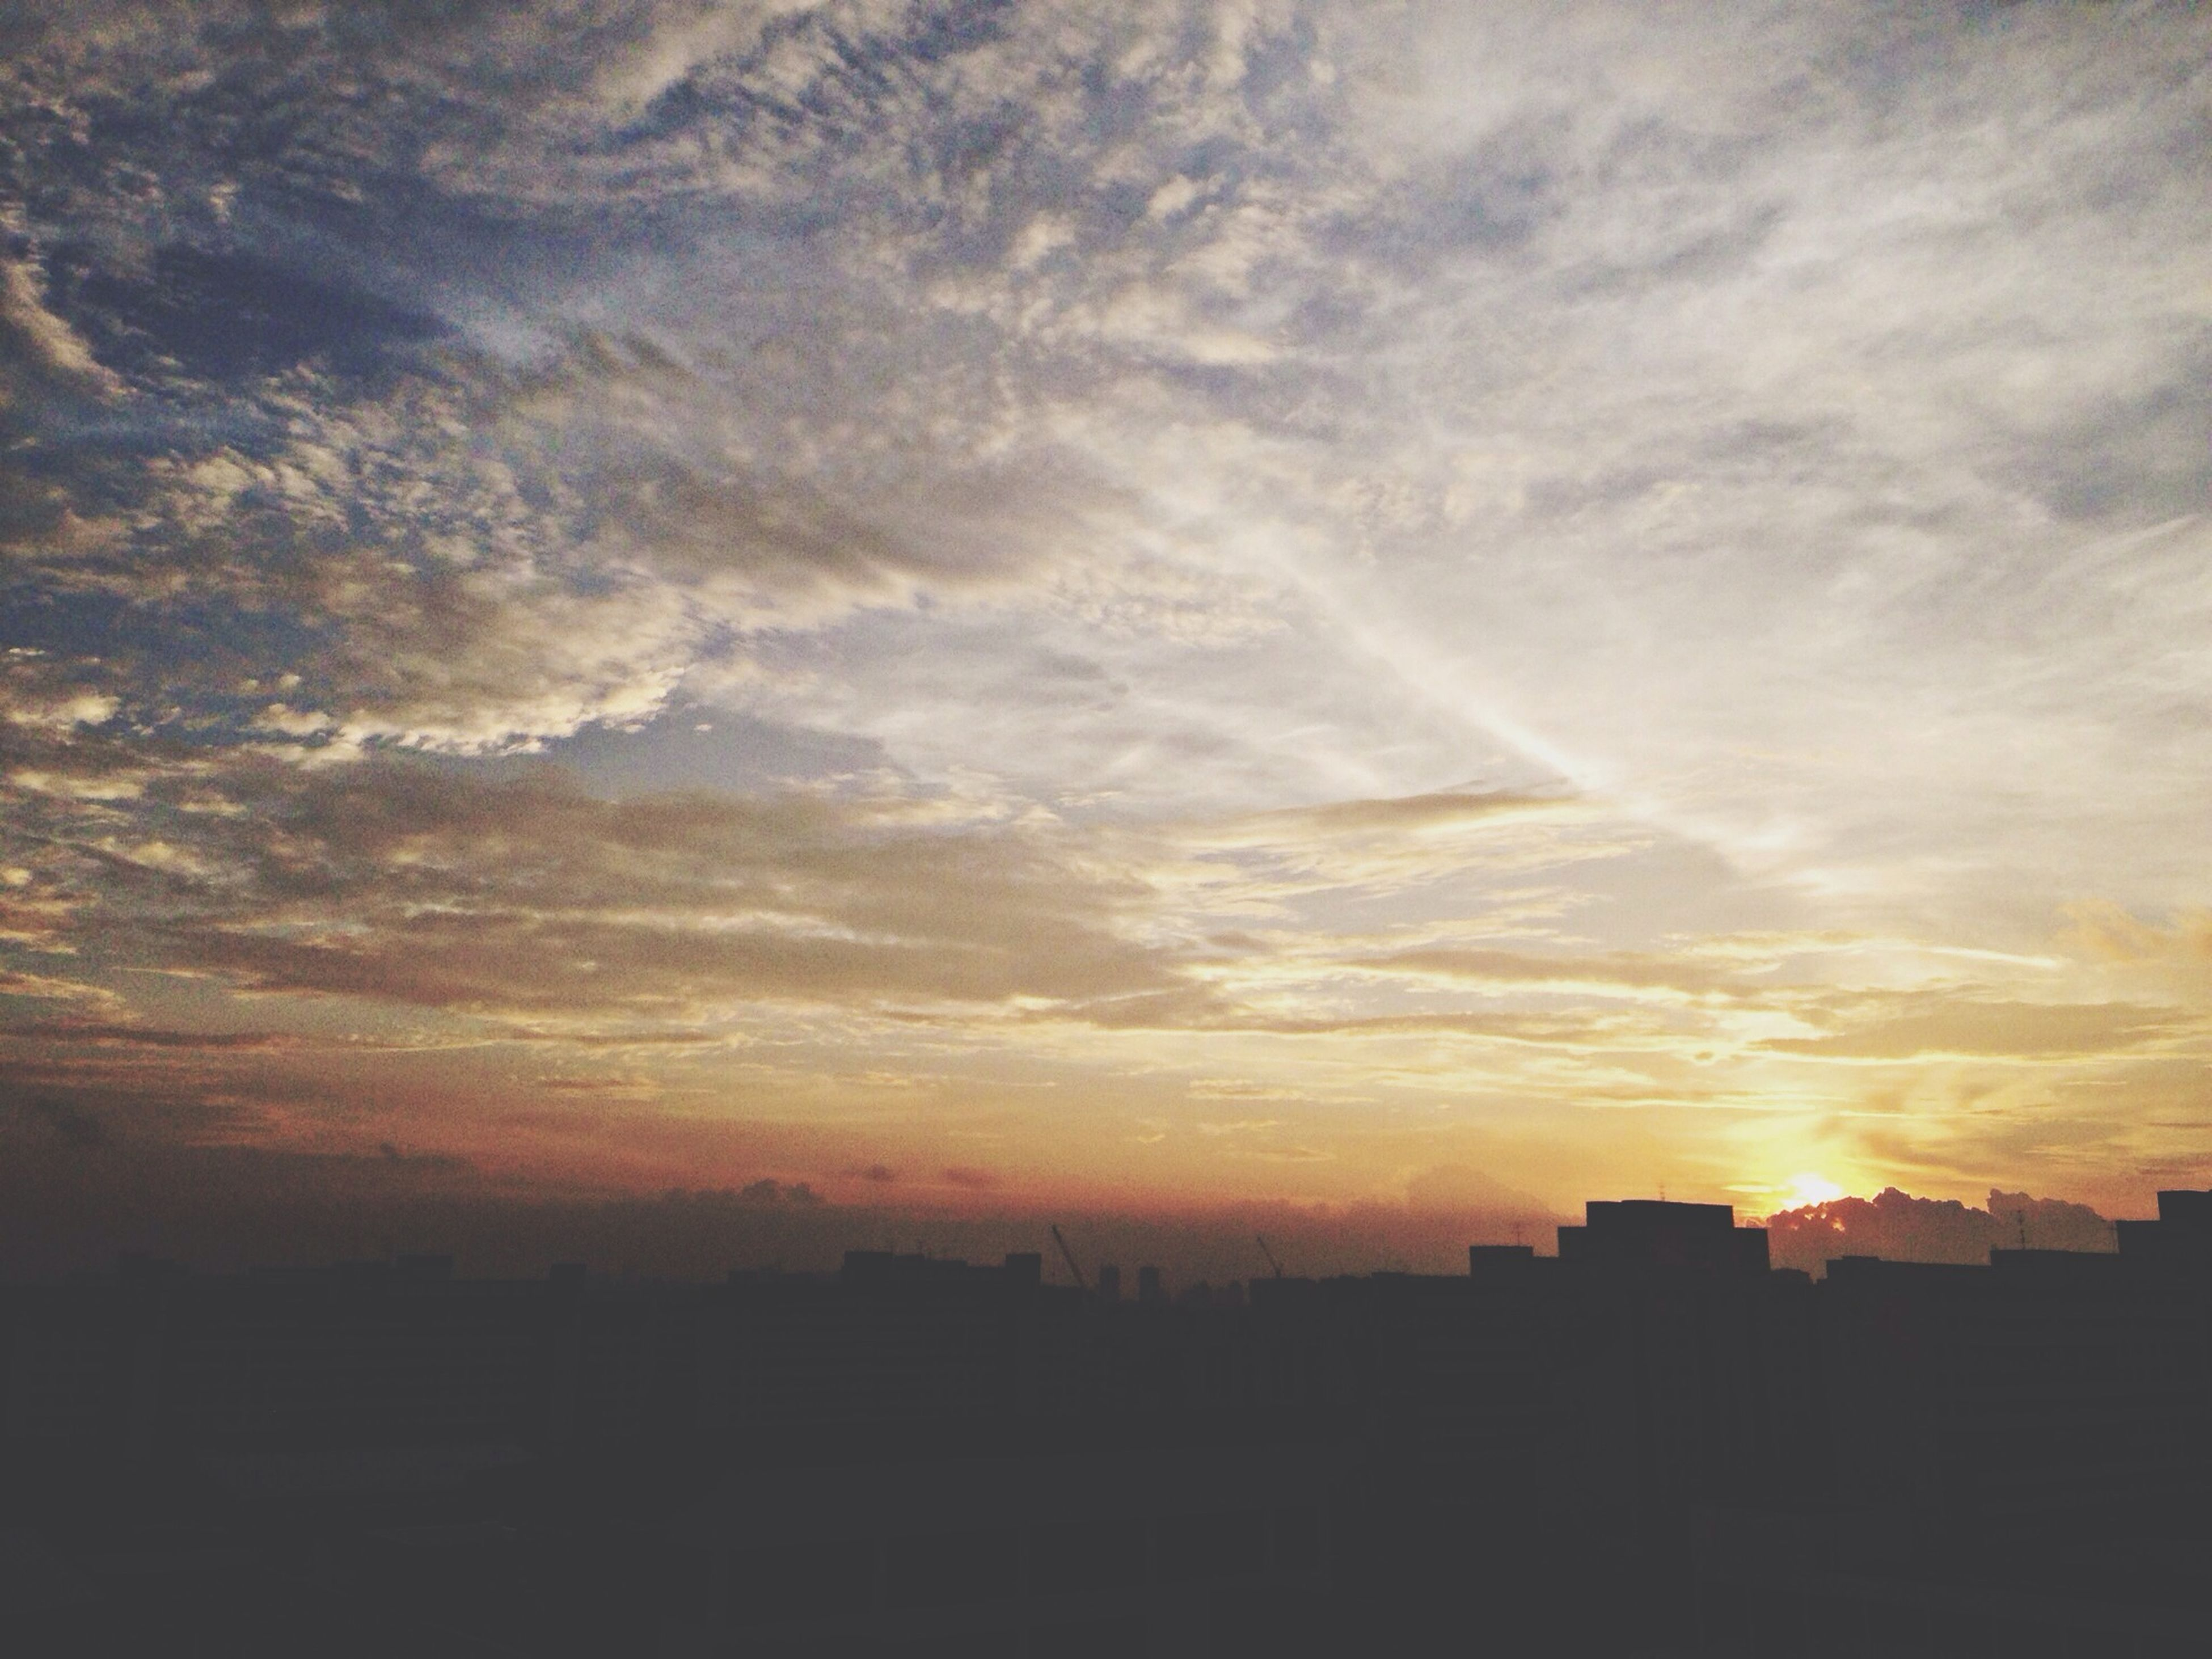 sunset, sky, building exterior, silhouette, orange color, built structure, architecture, cloud - sky, scenics, beauty in nature, nature, cloud, tranquility, tranquil scene, idyllic, city, cloudy, sunlight, outdoors, sun